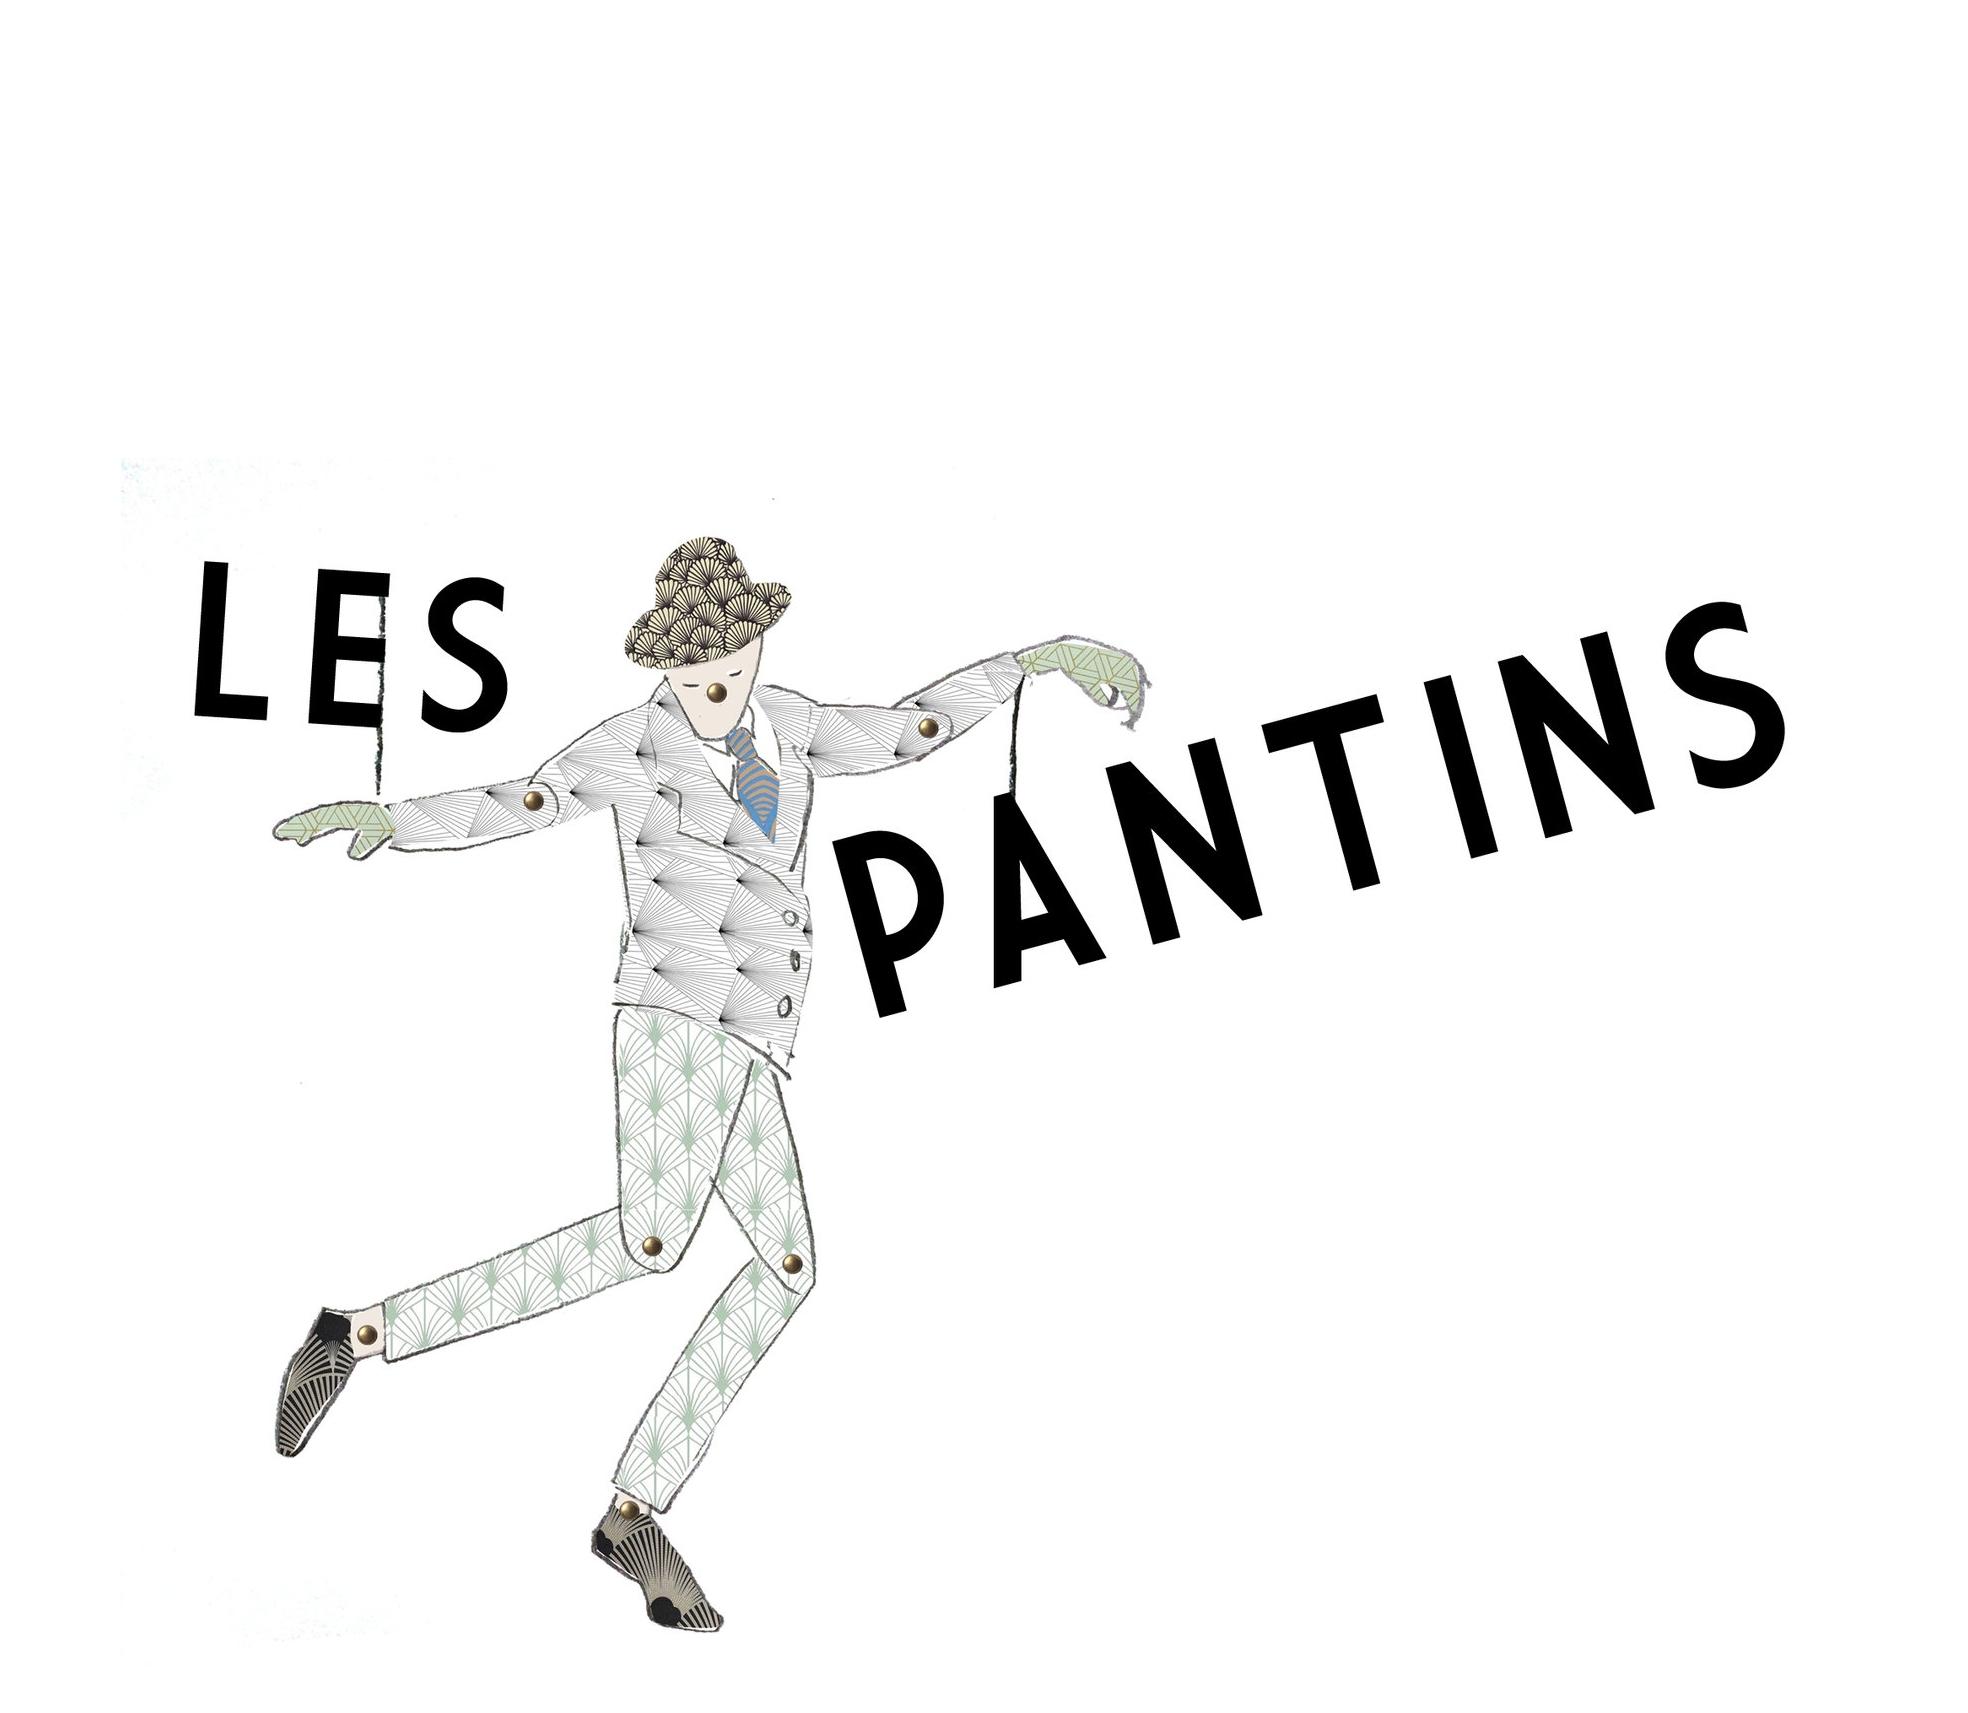 pantins